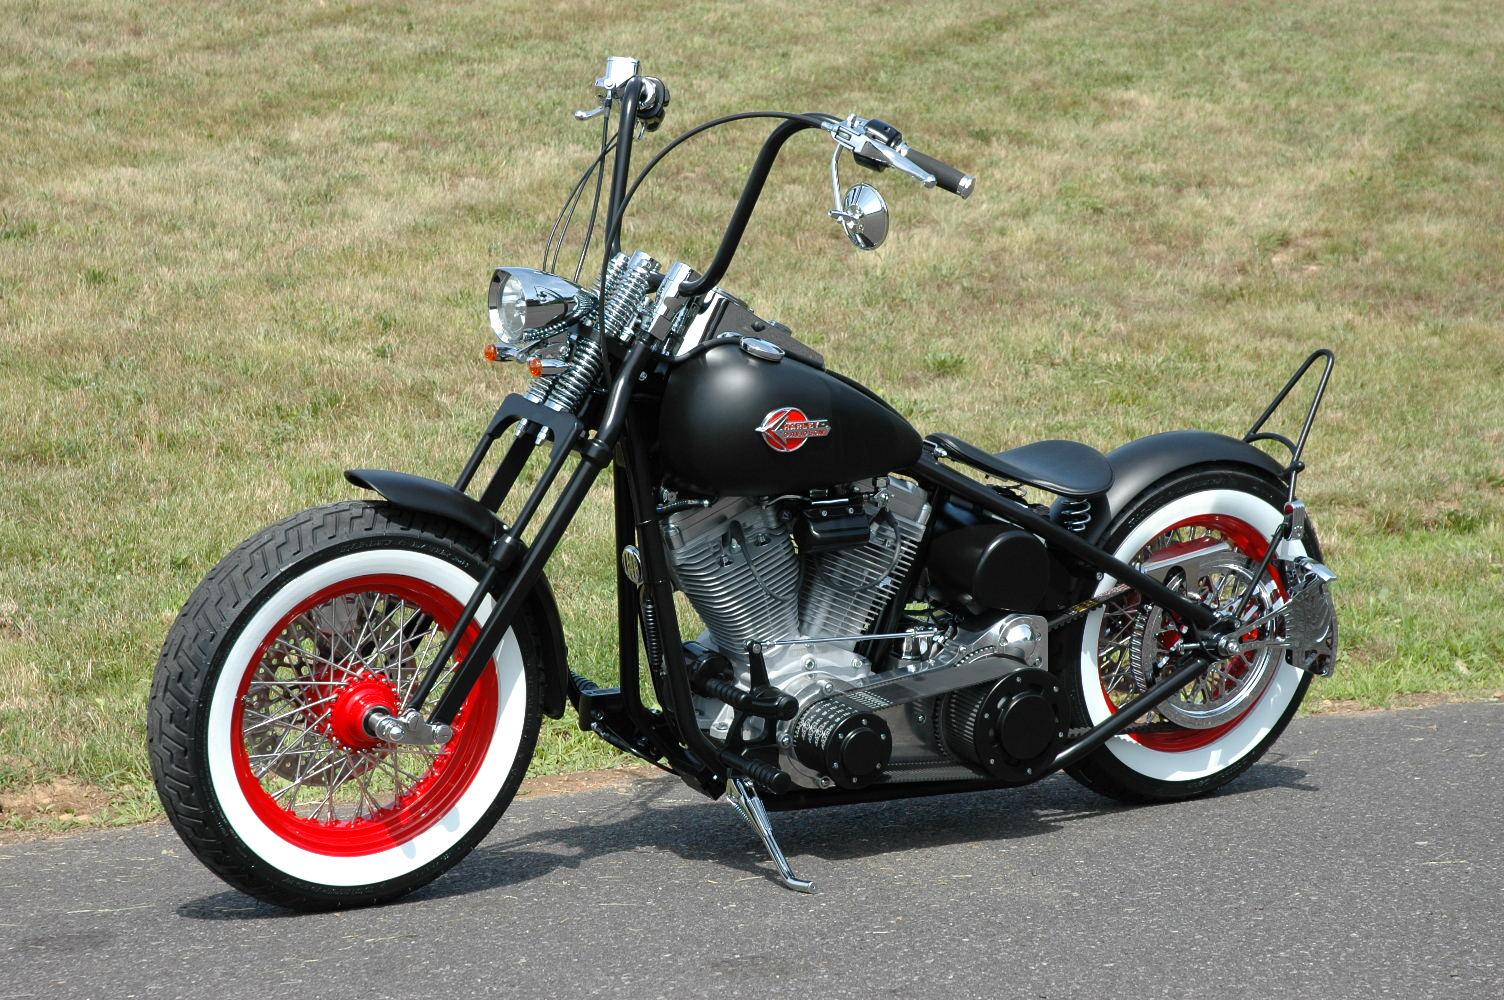 Hot Rod Harley >> biker excalibur II: HARLEY POWERED RED WHEEL HOT ROD